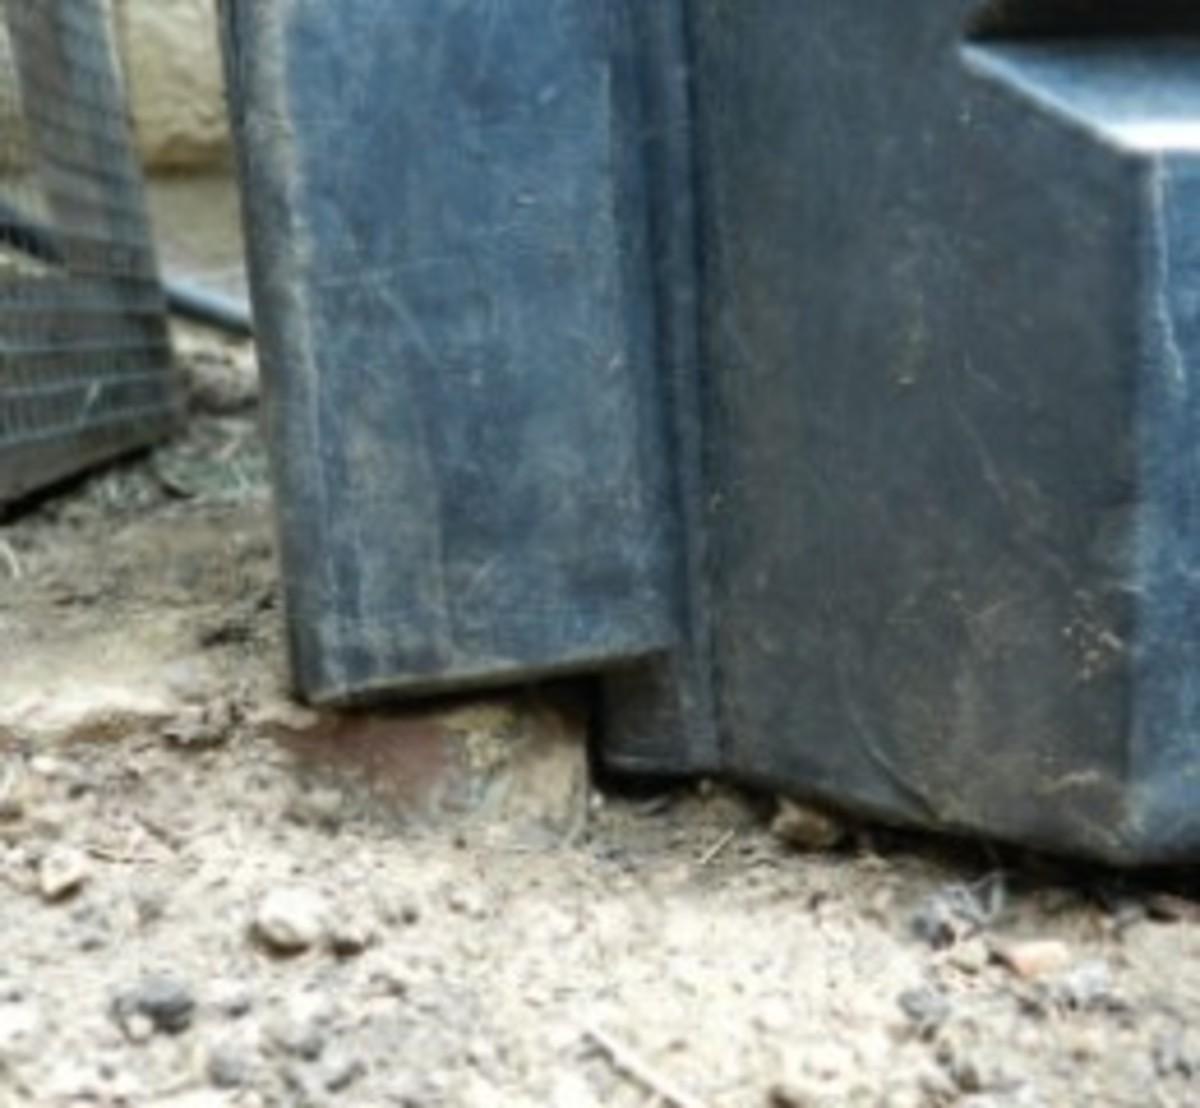 Bottom of GG compost bin